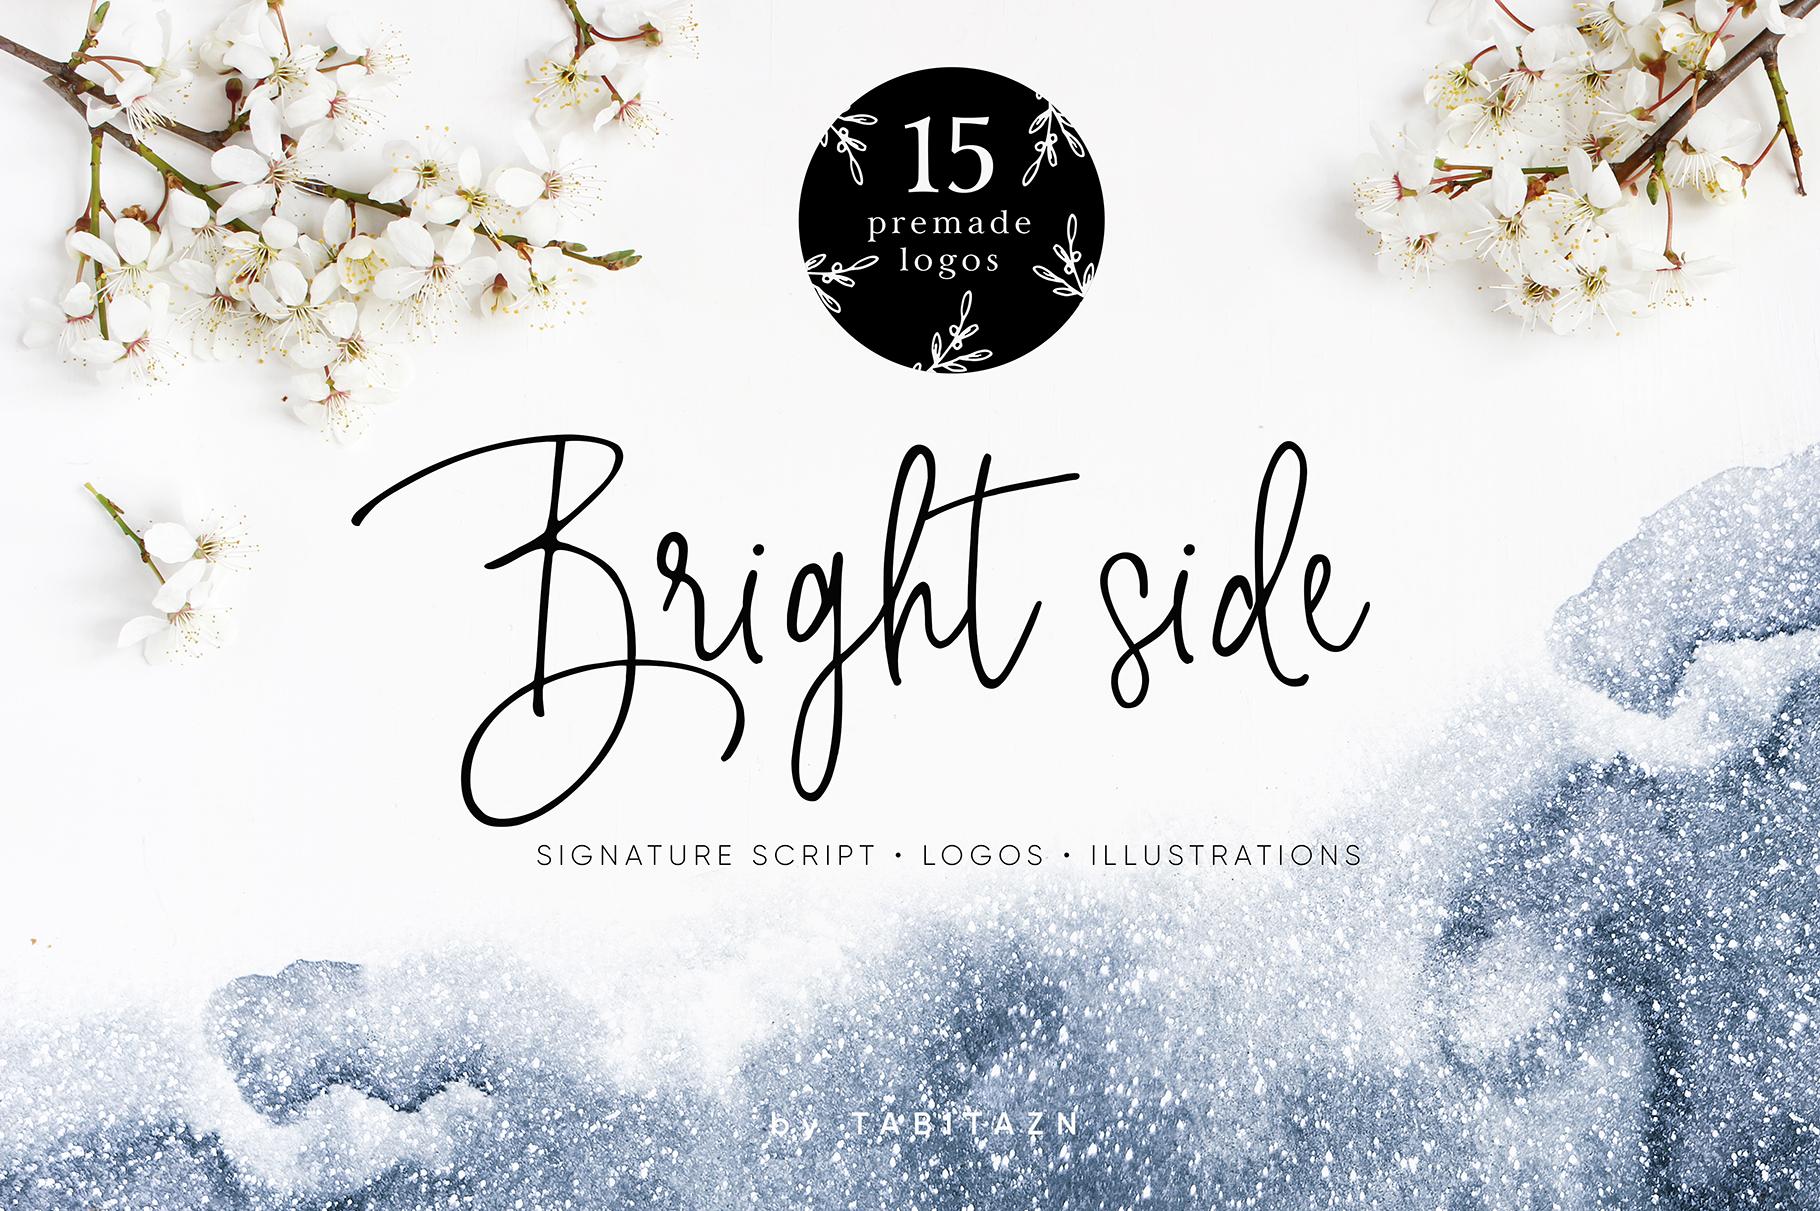 Bright side signature script font+ logos example image 1